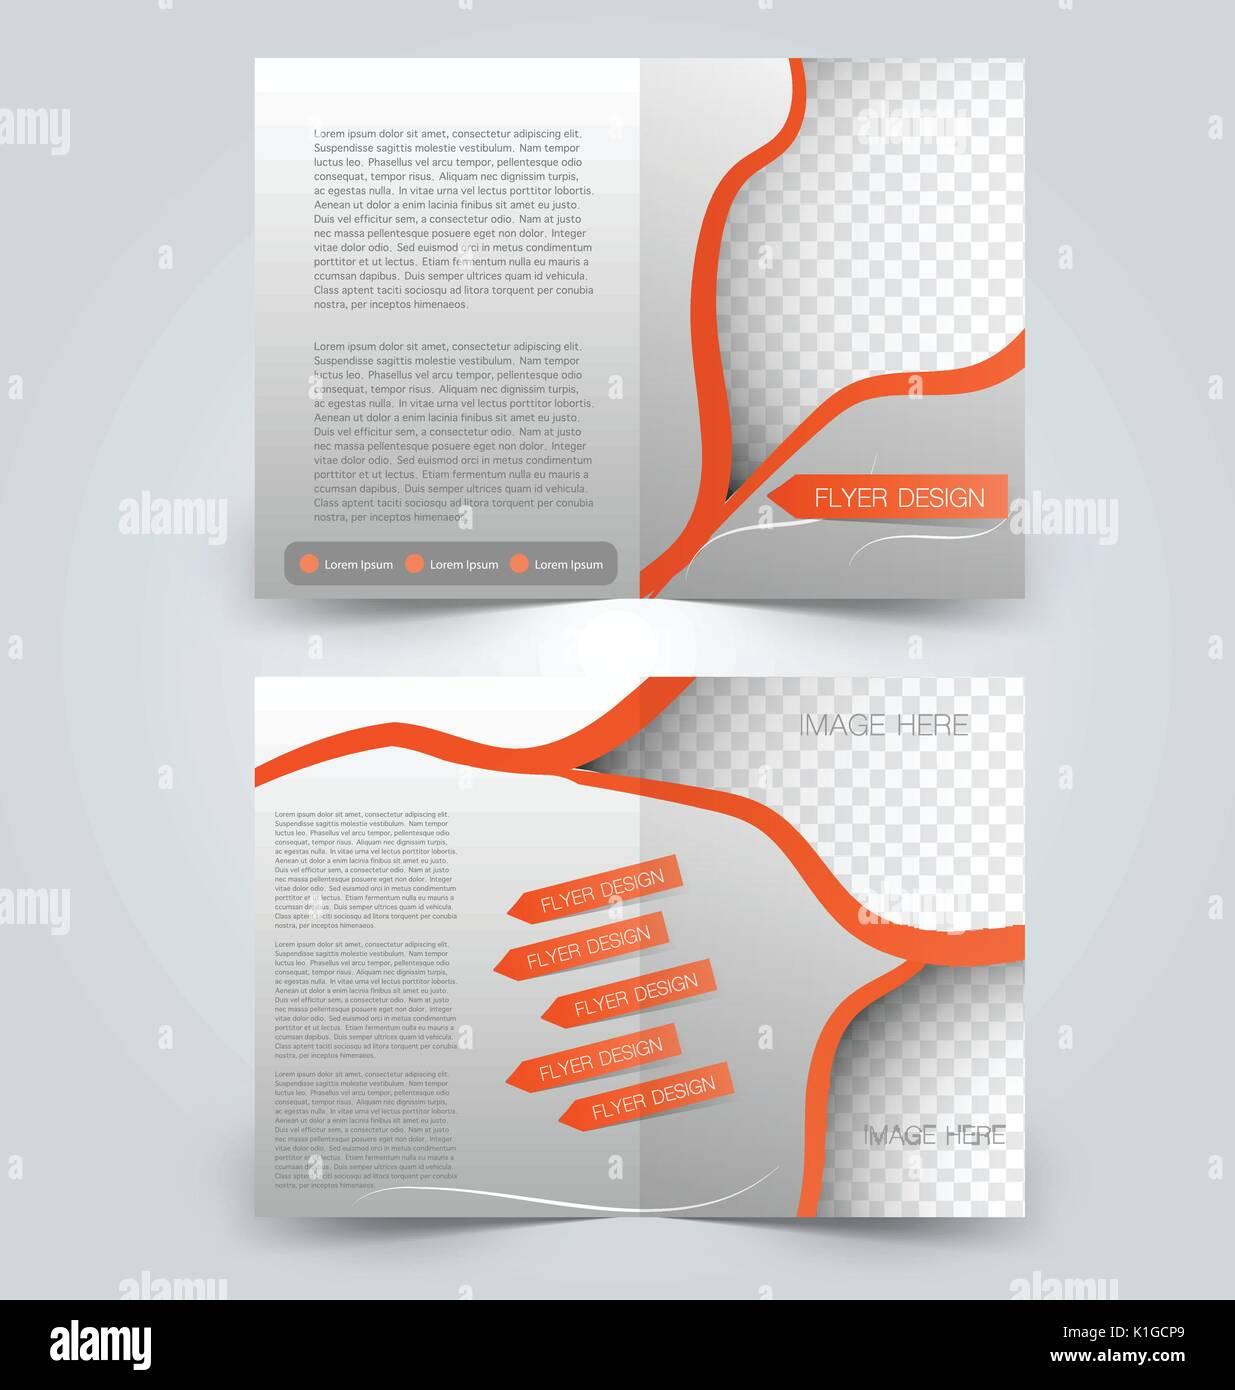 Back Page Of Magazine Stockfotos & Back Page Of Magazine Bilder - Alamy